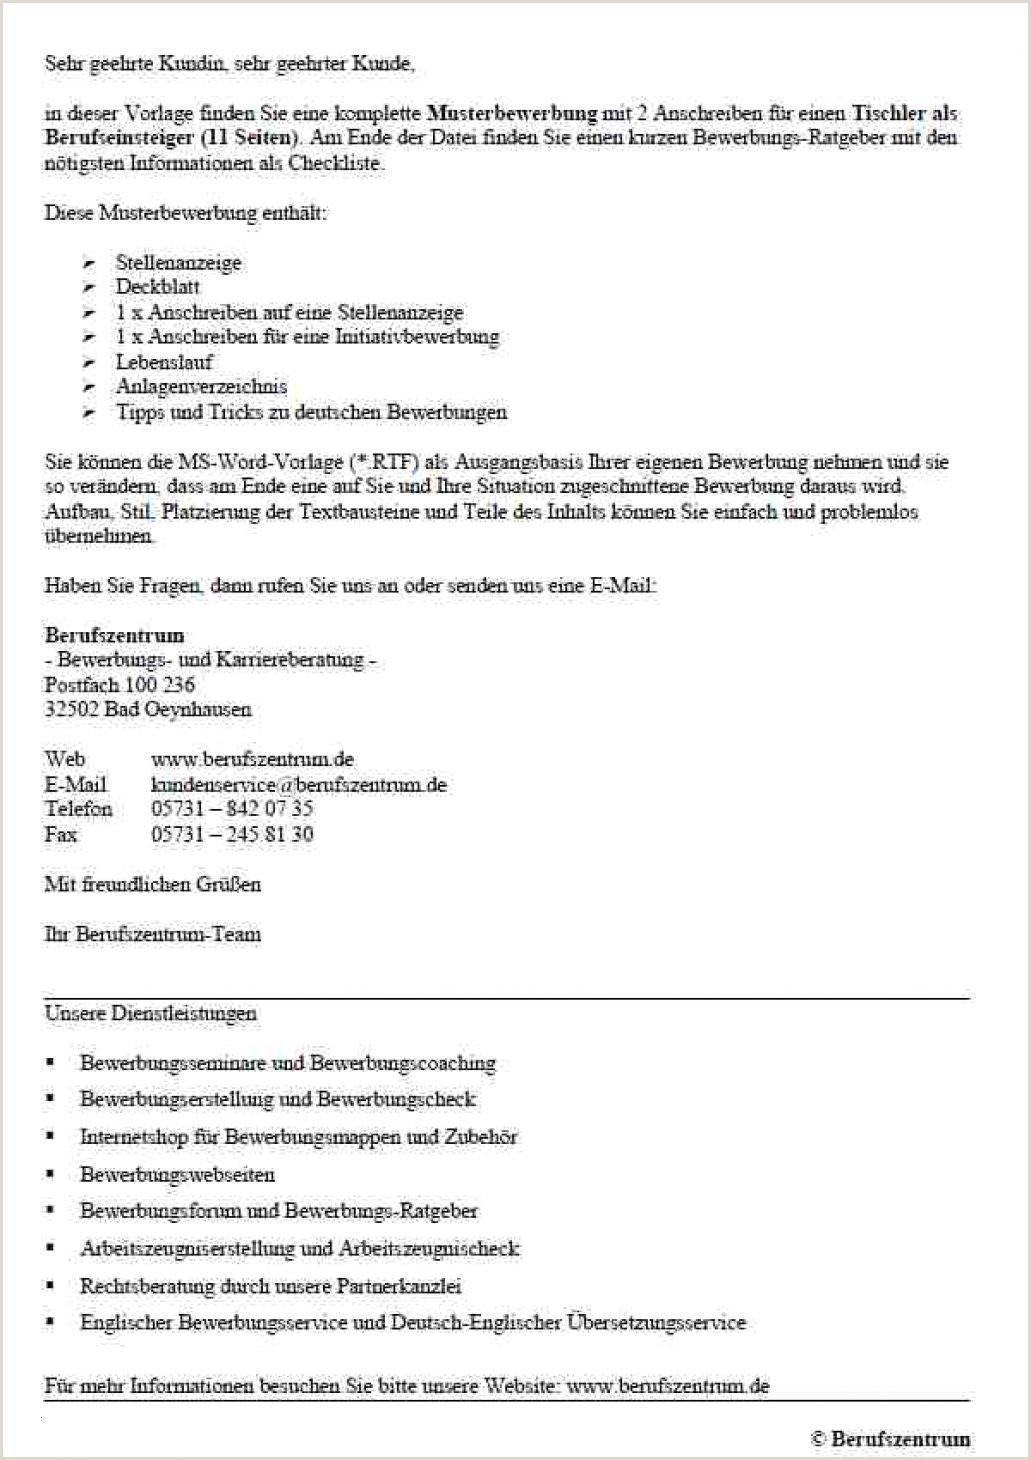 Lebenslauf Muster Krankenschwester 16 Bewerbungsschreiben Muster Ausbildung Krankenschwester